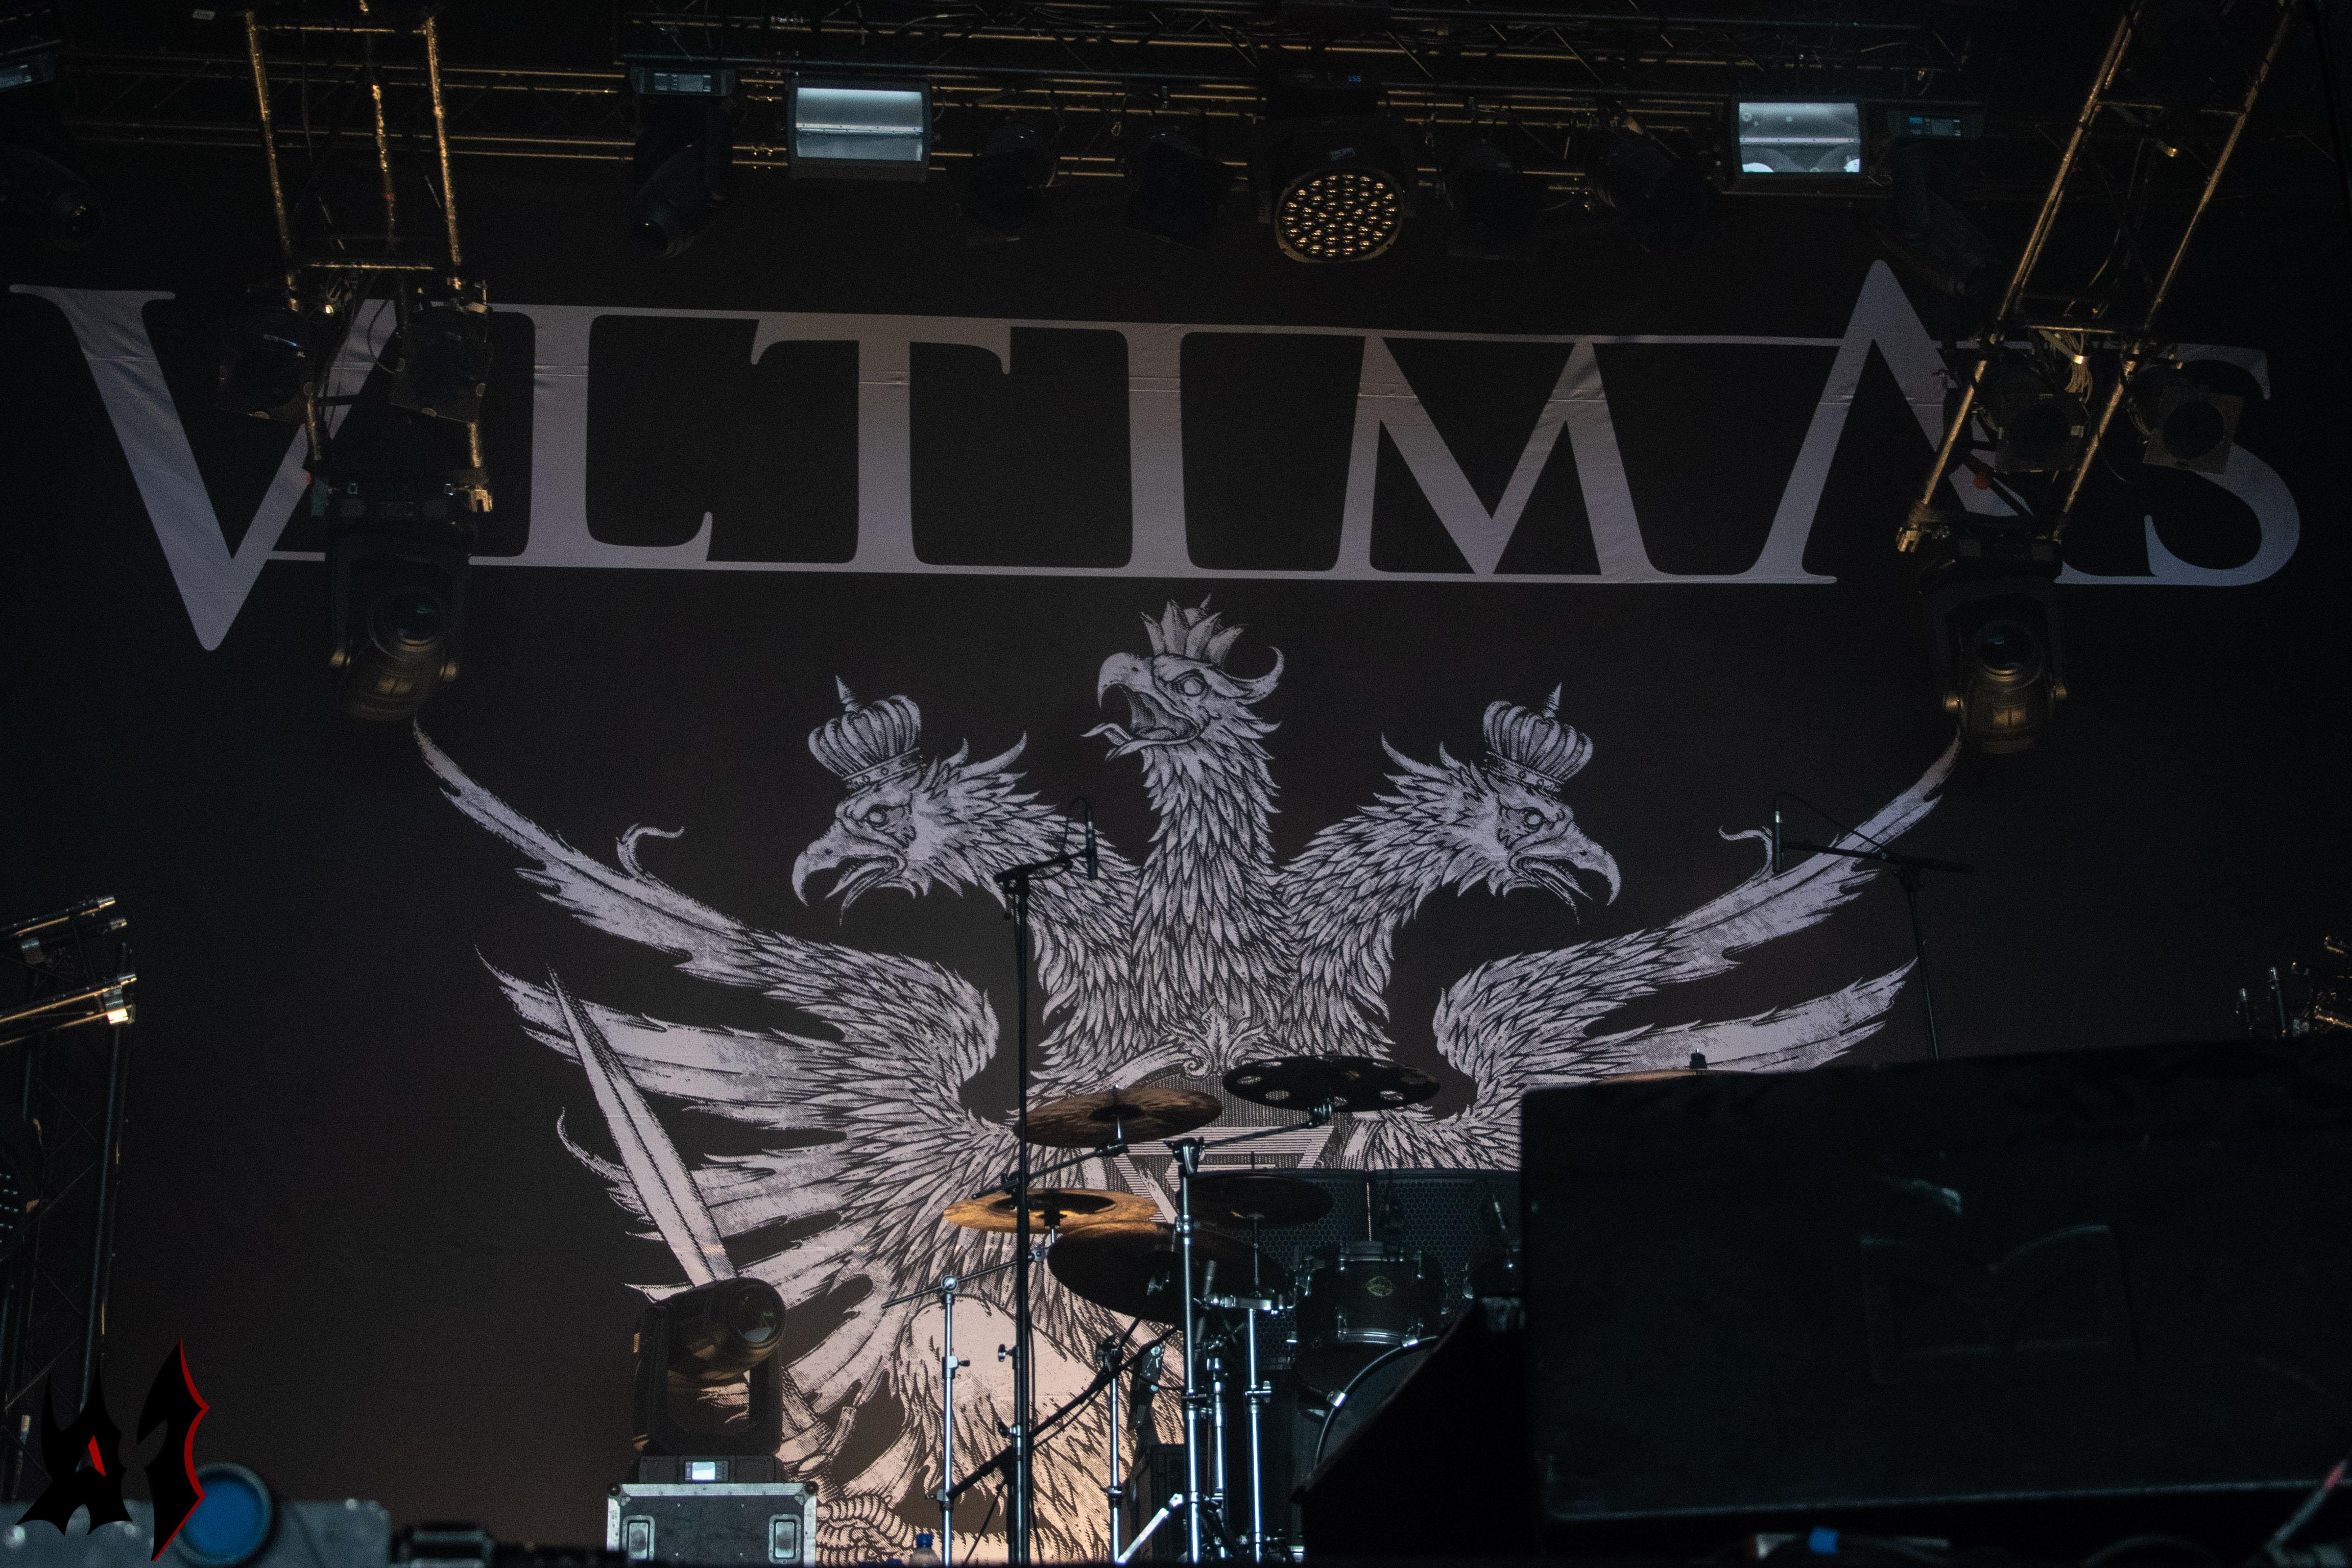 Hellfest - Vltimas - 1